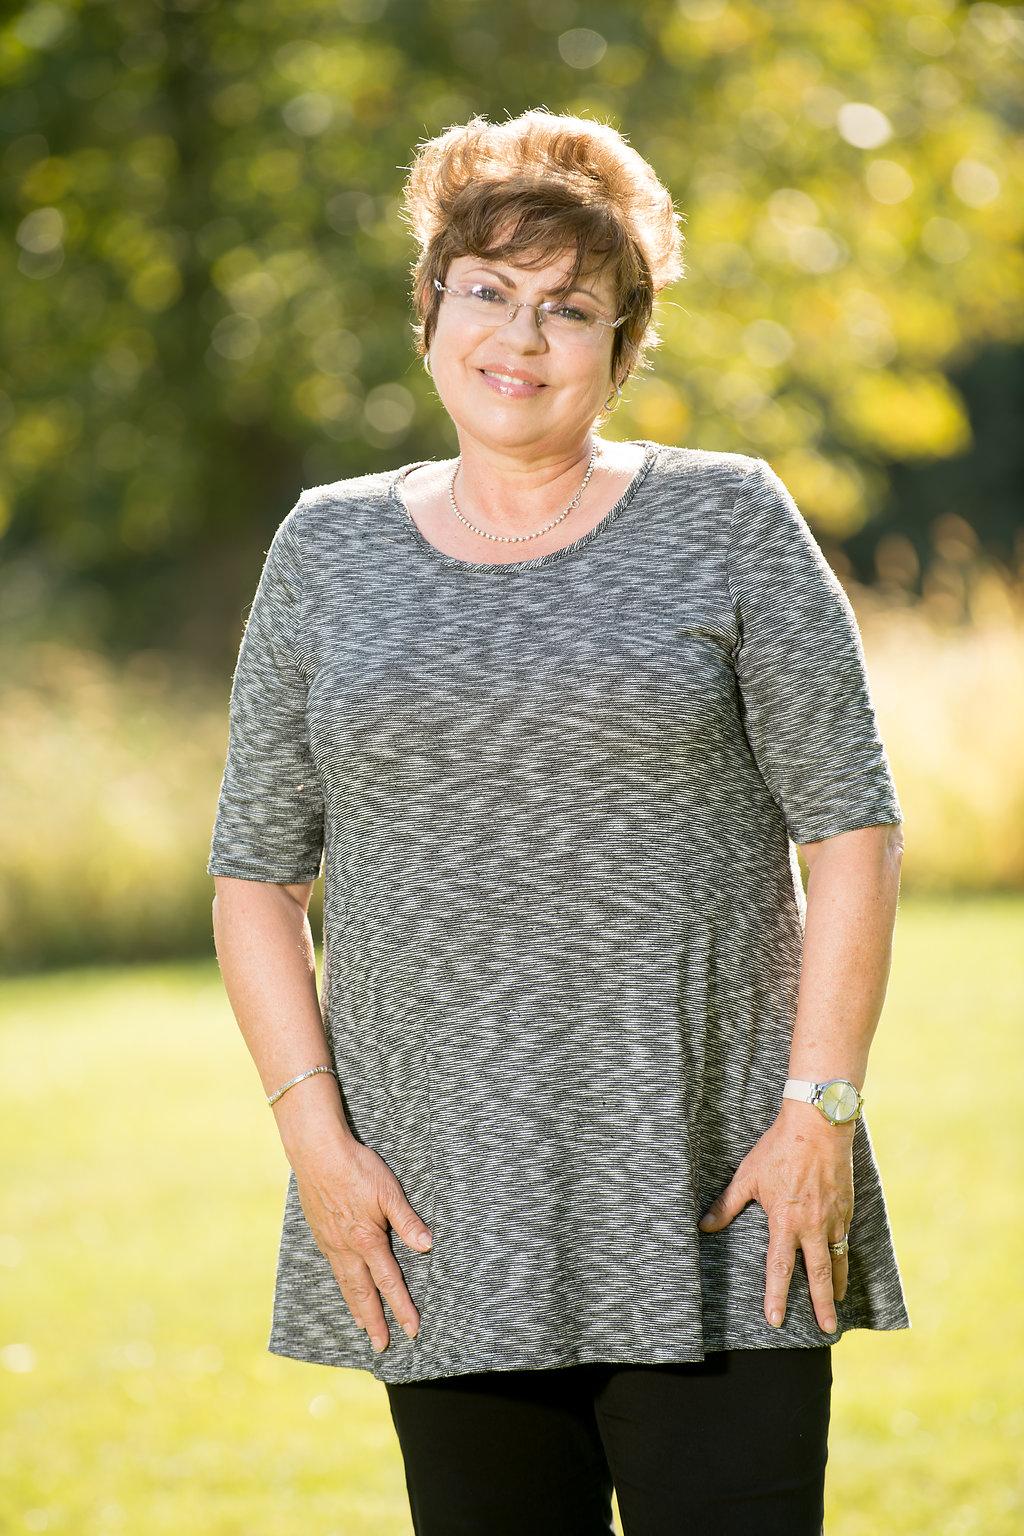 Pine Cobble School Spanish Teacher - Maria Mac